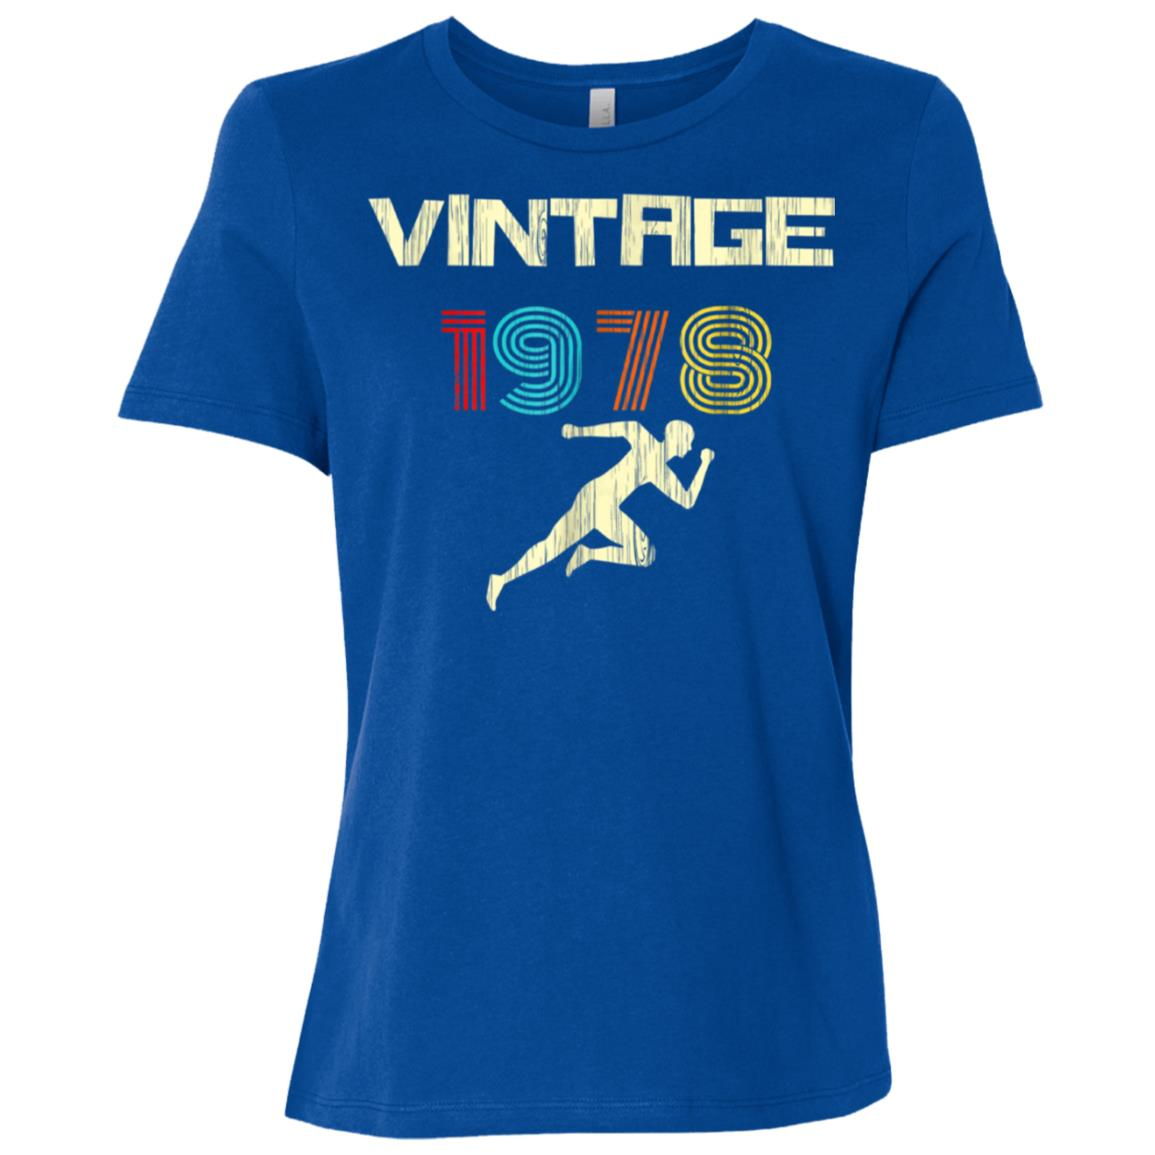 Runner's Vintage 1978 40th Birthday Women Short Sleeve T-Shirt